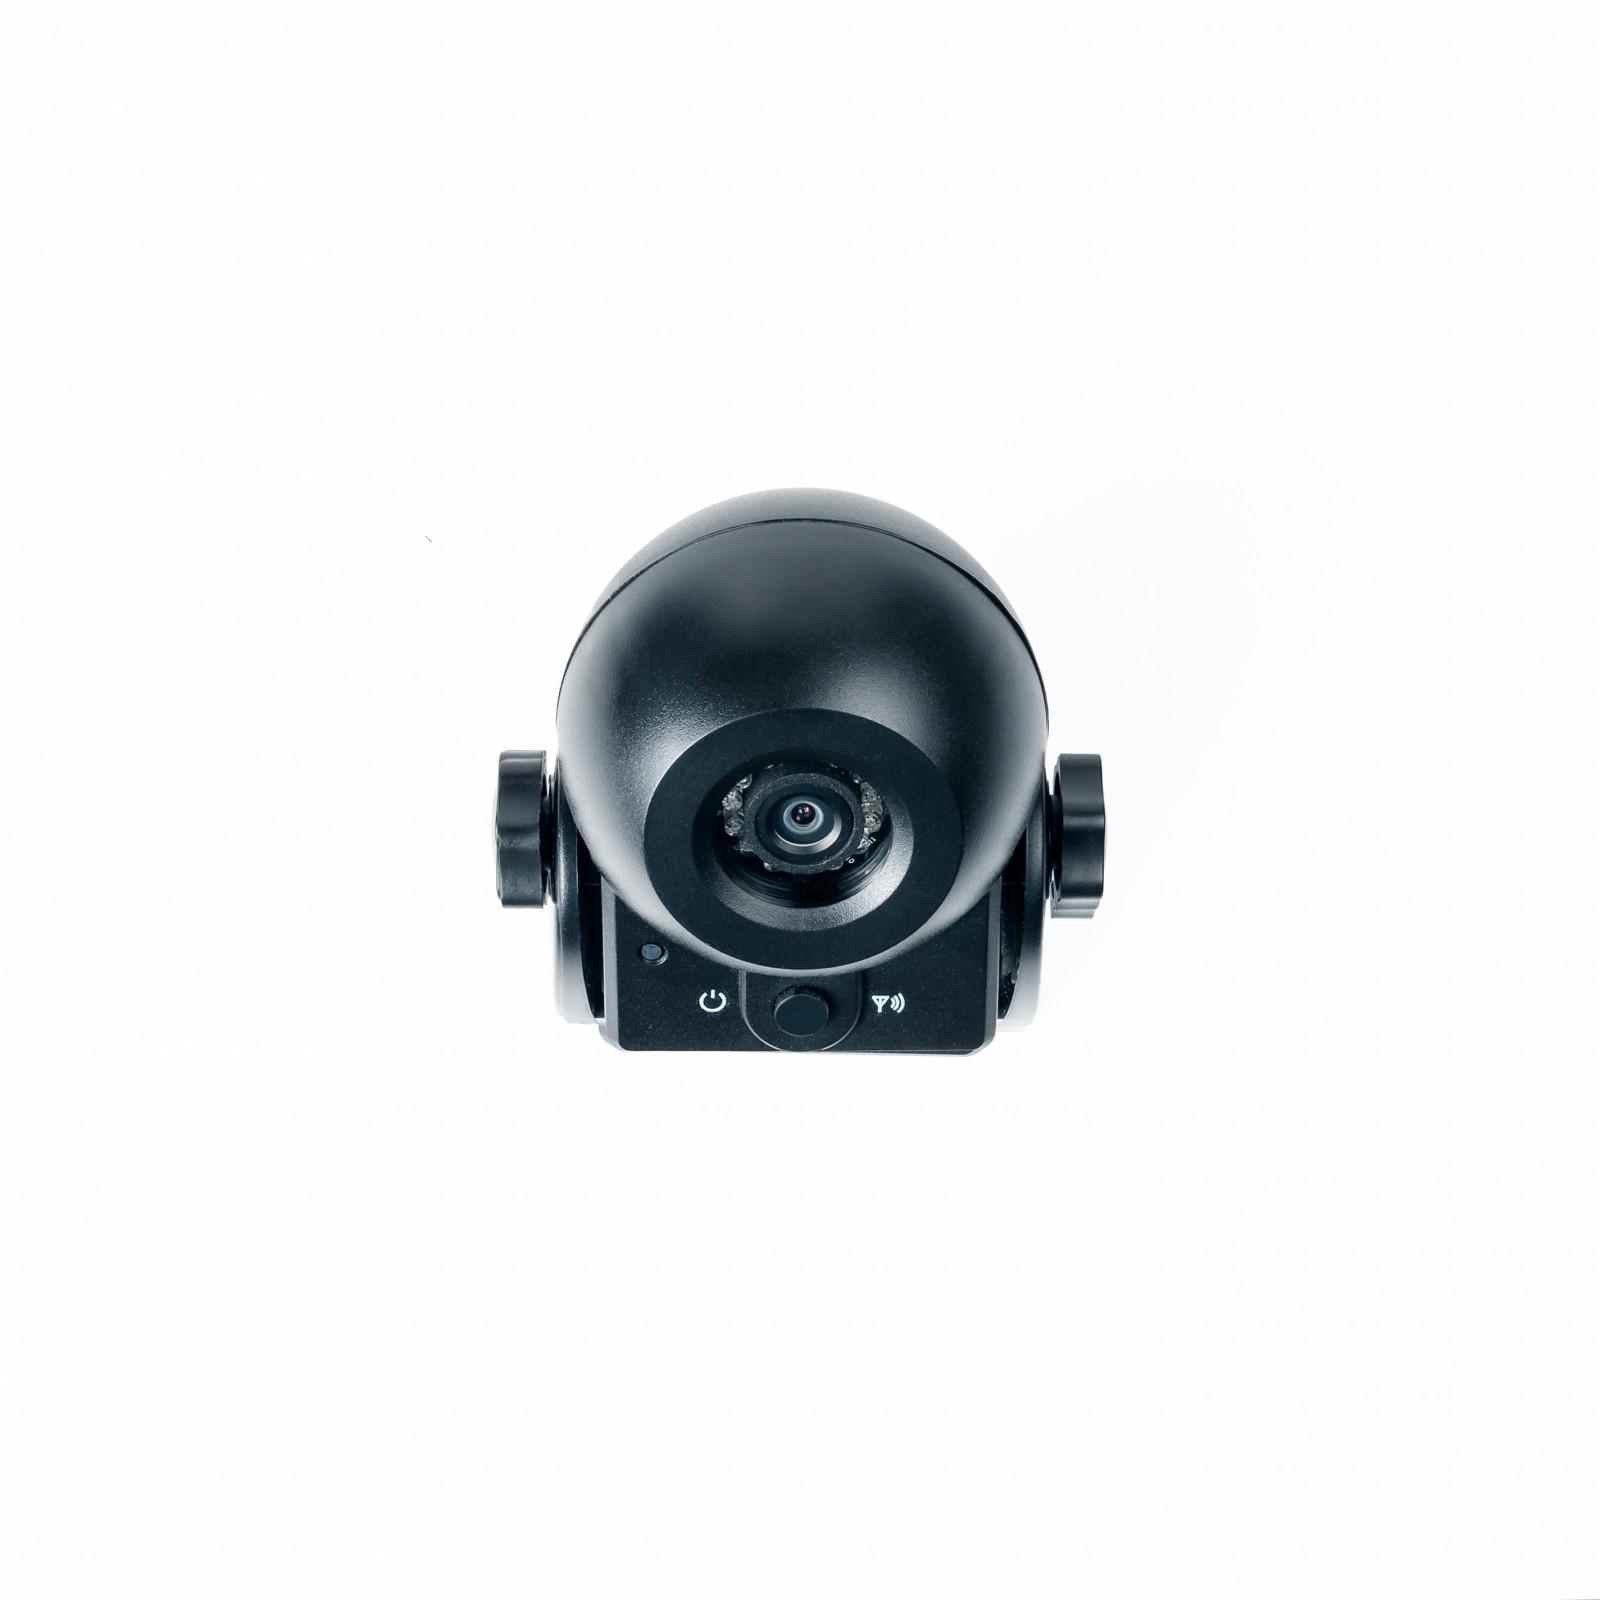 wifi auto r ckfahrkamera akku wiederaufladbar mit magnet. Black Bedroom Furniture Sets. Home Design Ideas